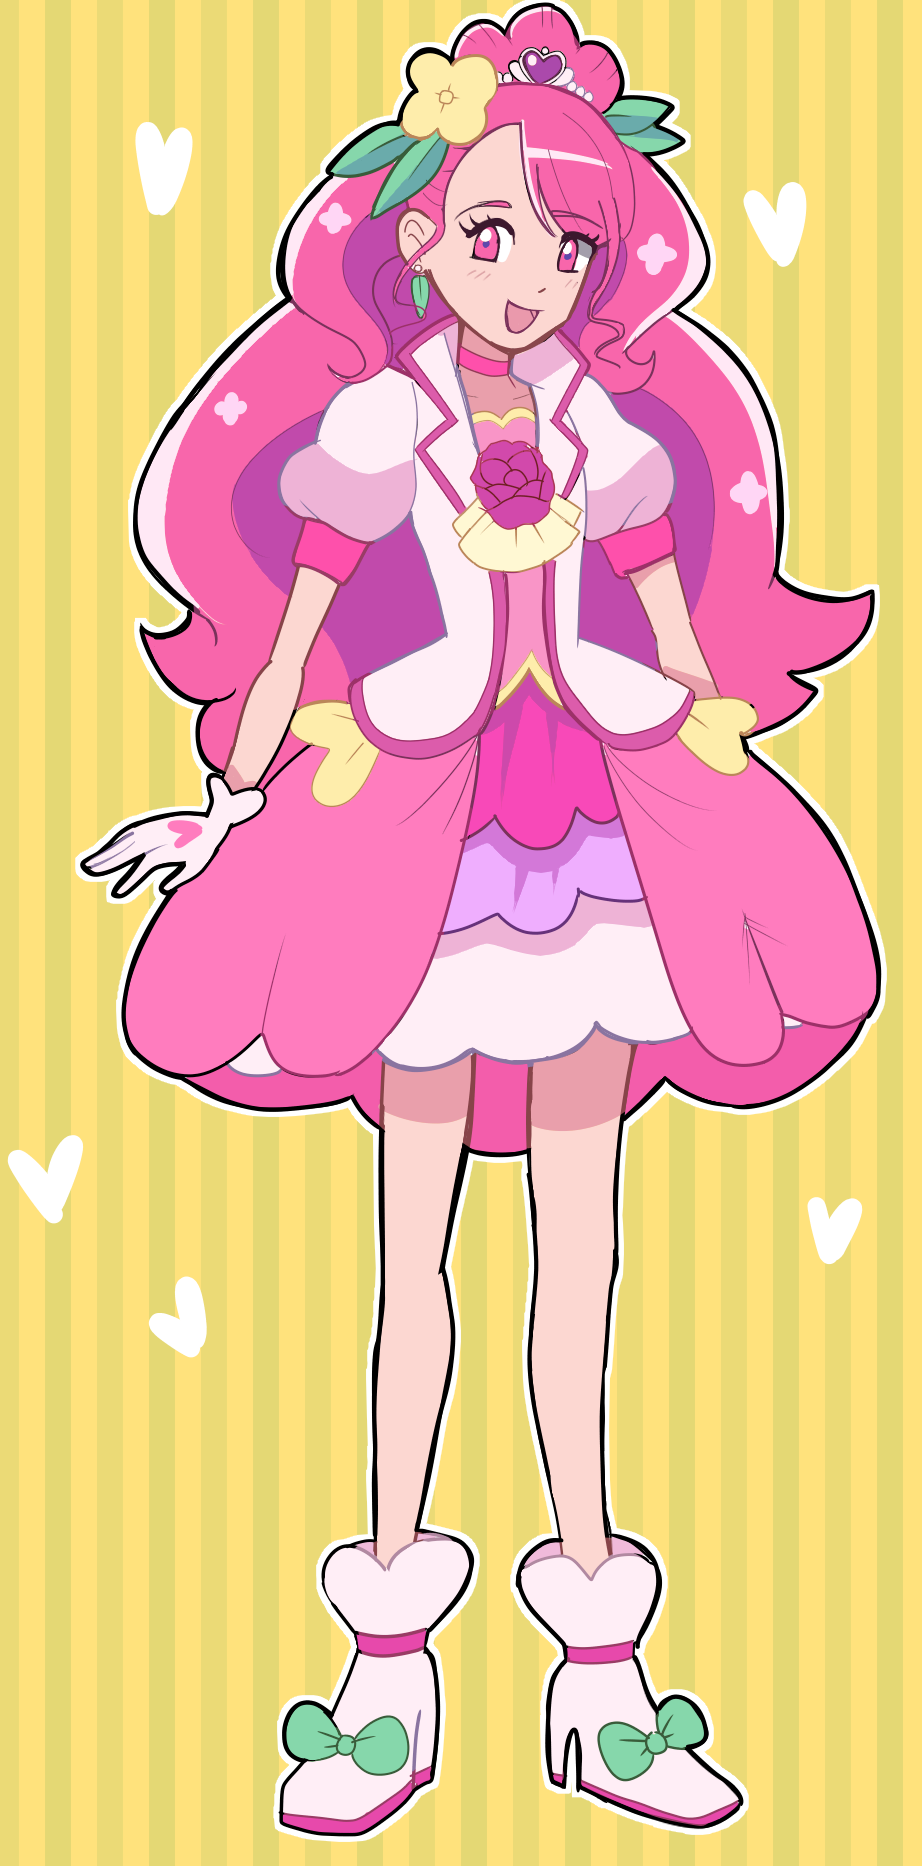 Cure Grace  Illust of gummyshark mahoushoujo anime キュアグレース Precure magicalgirl Curegrace ヒーリングっどプリキュア